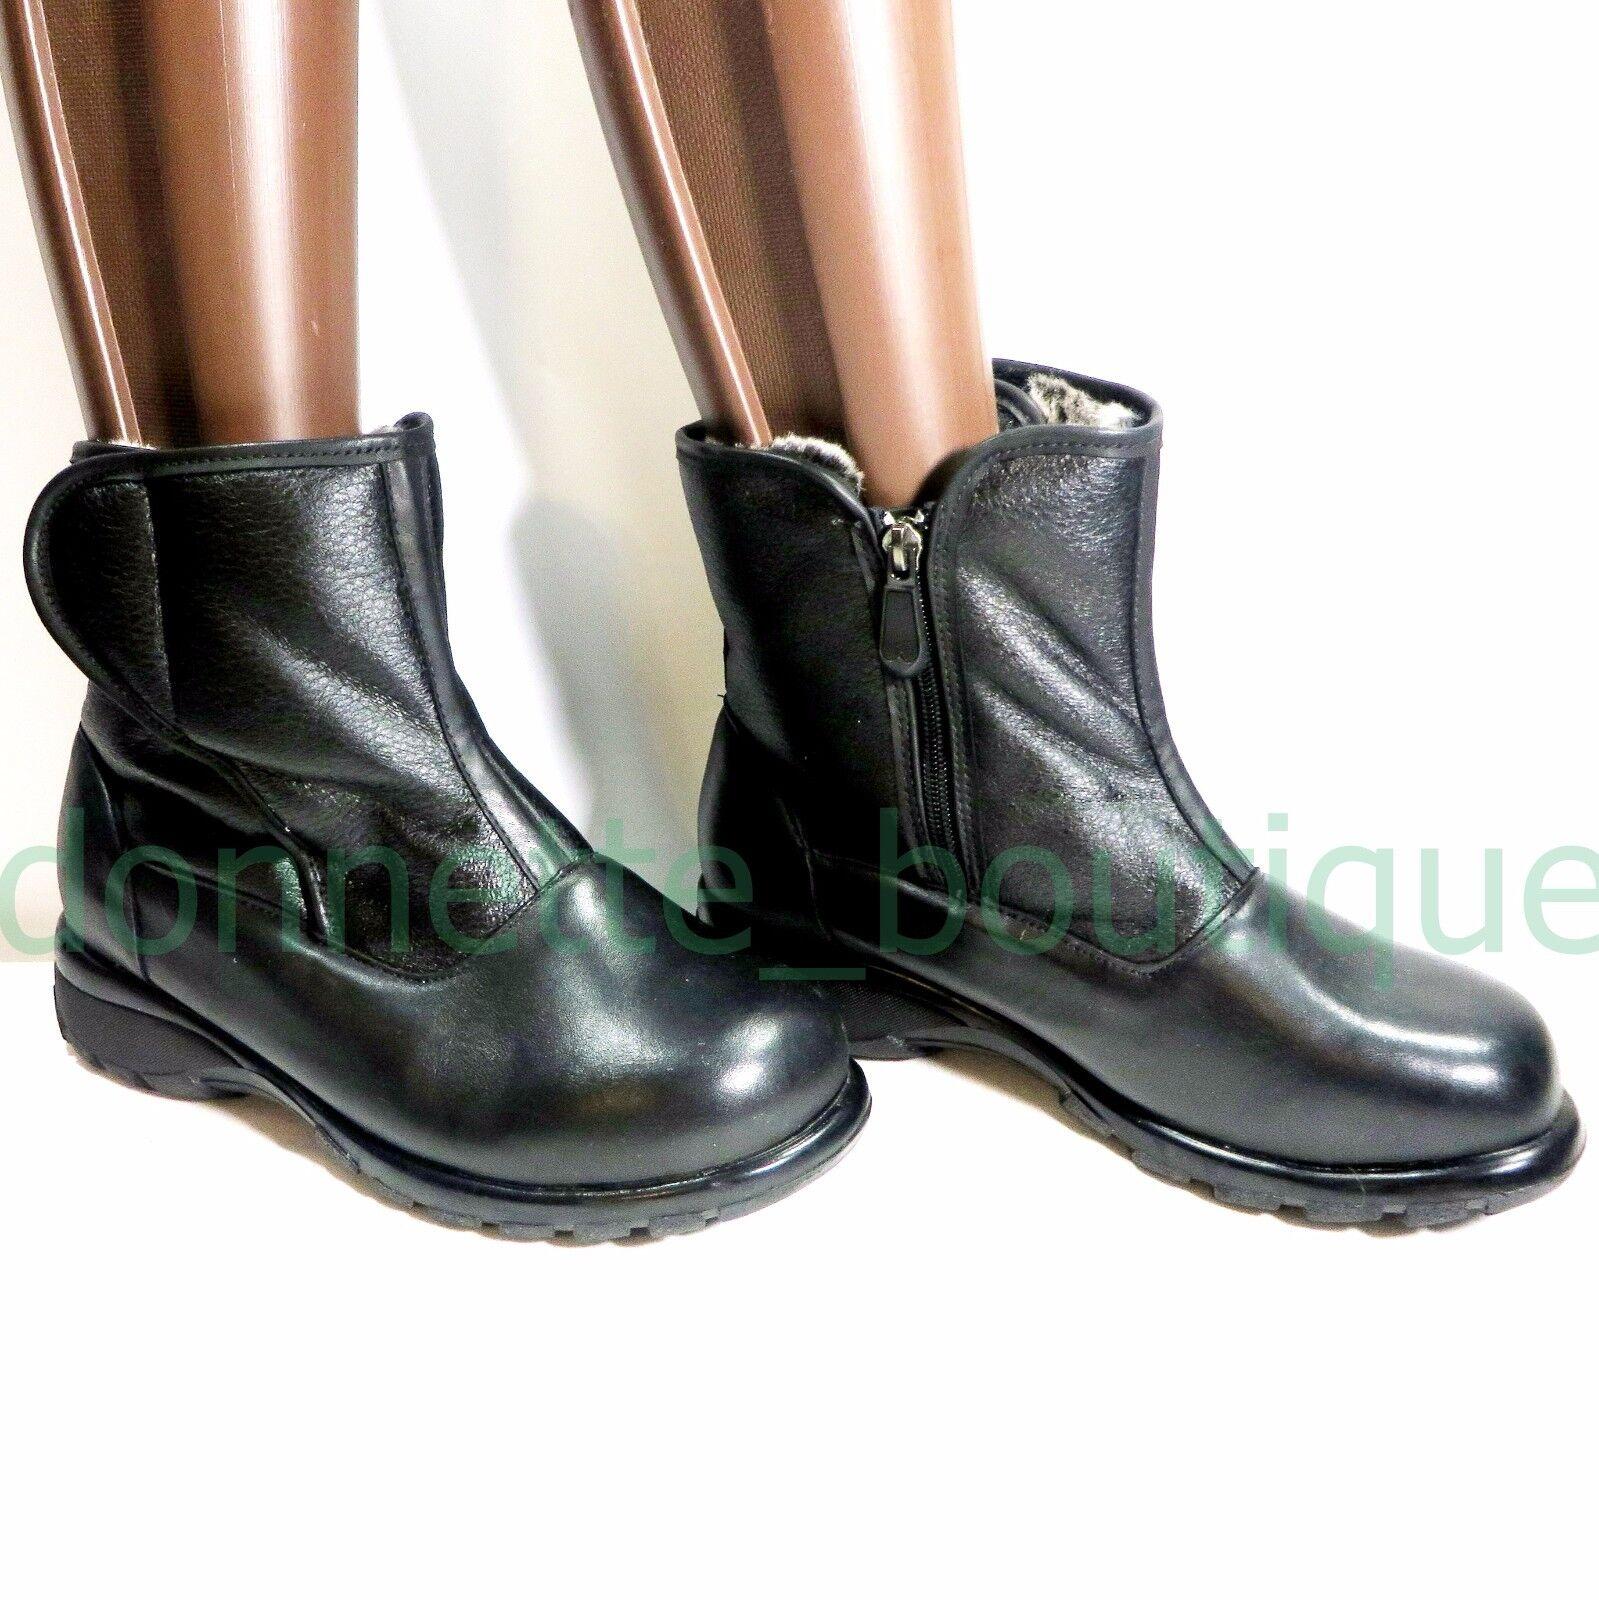 CLINIC EXTRA CLAIRE  Donna Pelle Faux Fur lined Stivali   Size 7 W EXUC